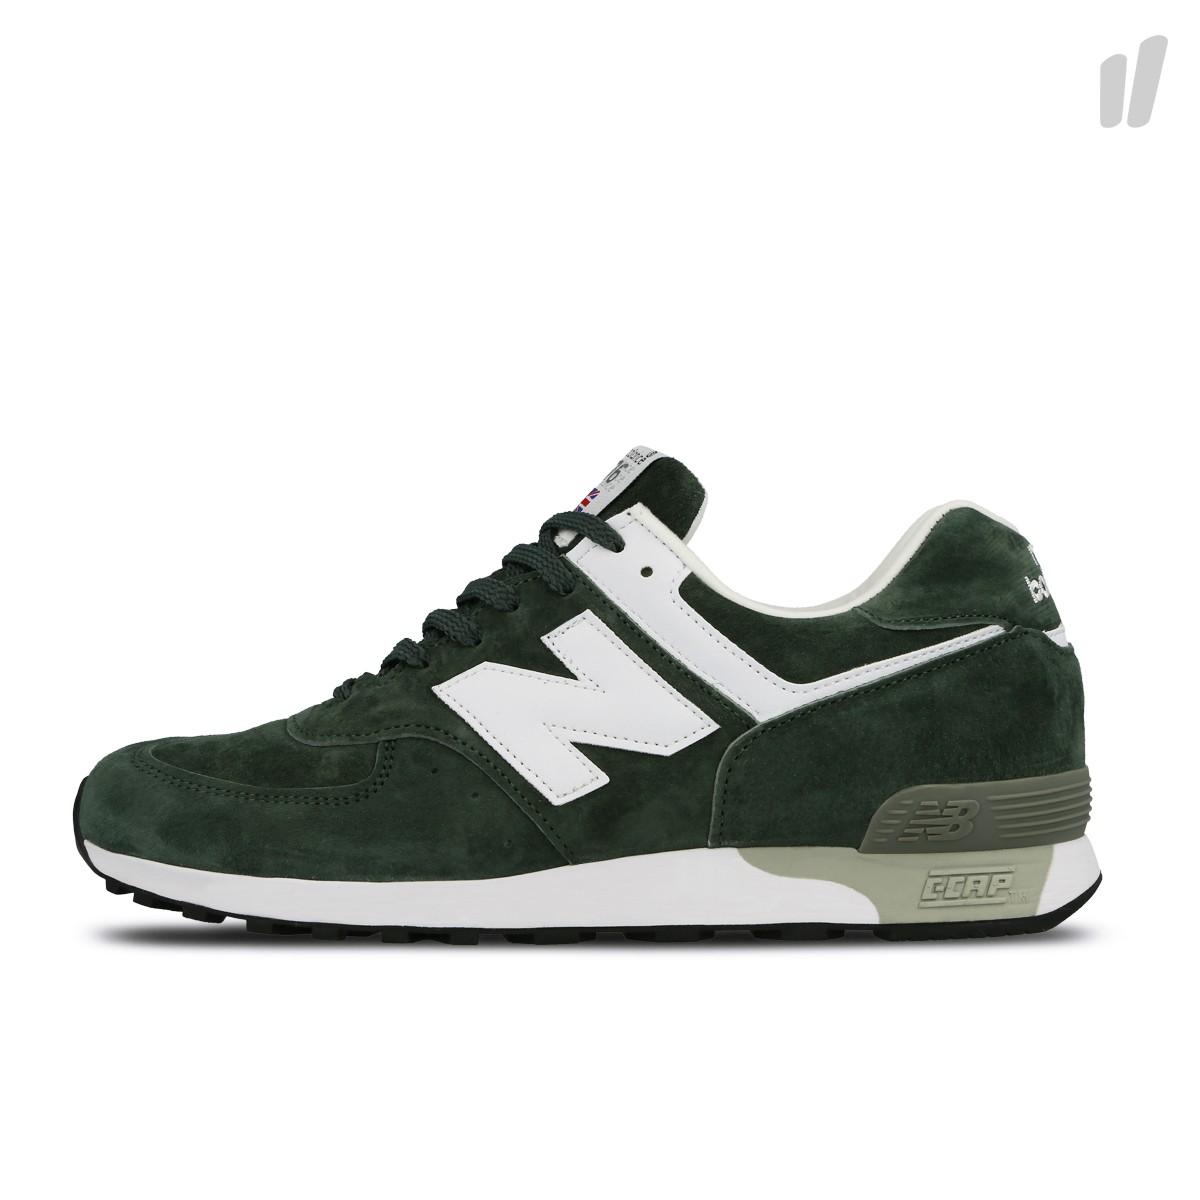 New Balance PNG - 36157